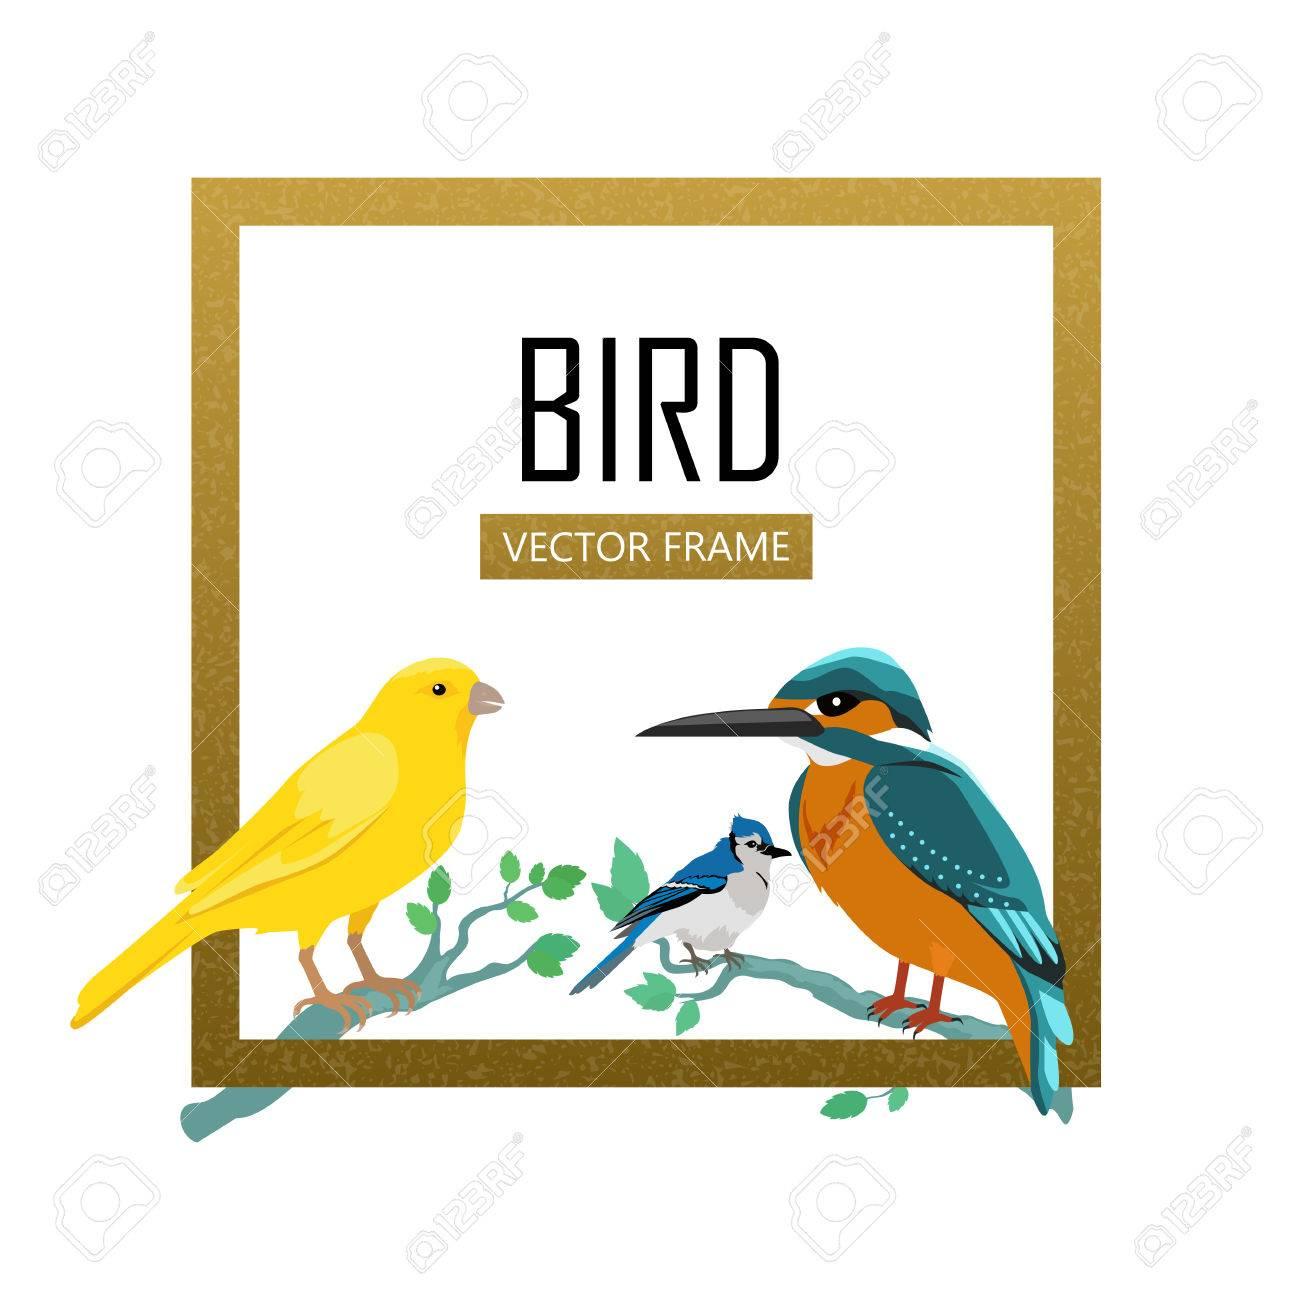 Vögel Rahmen Vektor. Farbige Tierwelt Konzept In Flacher Bauweise ...